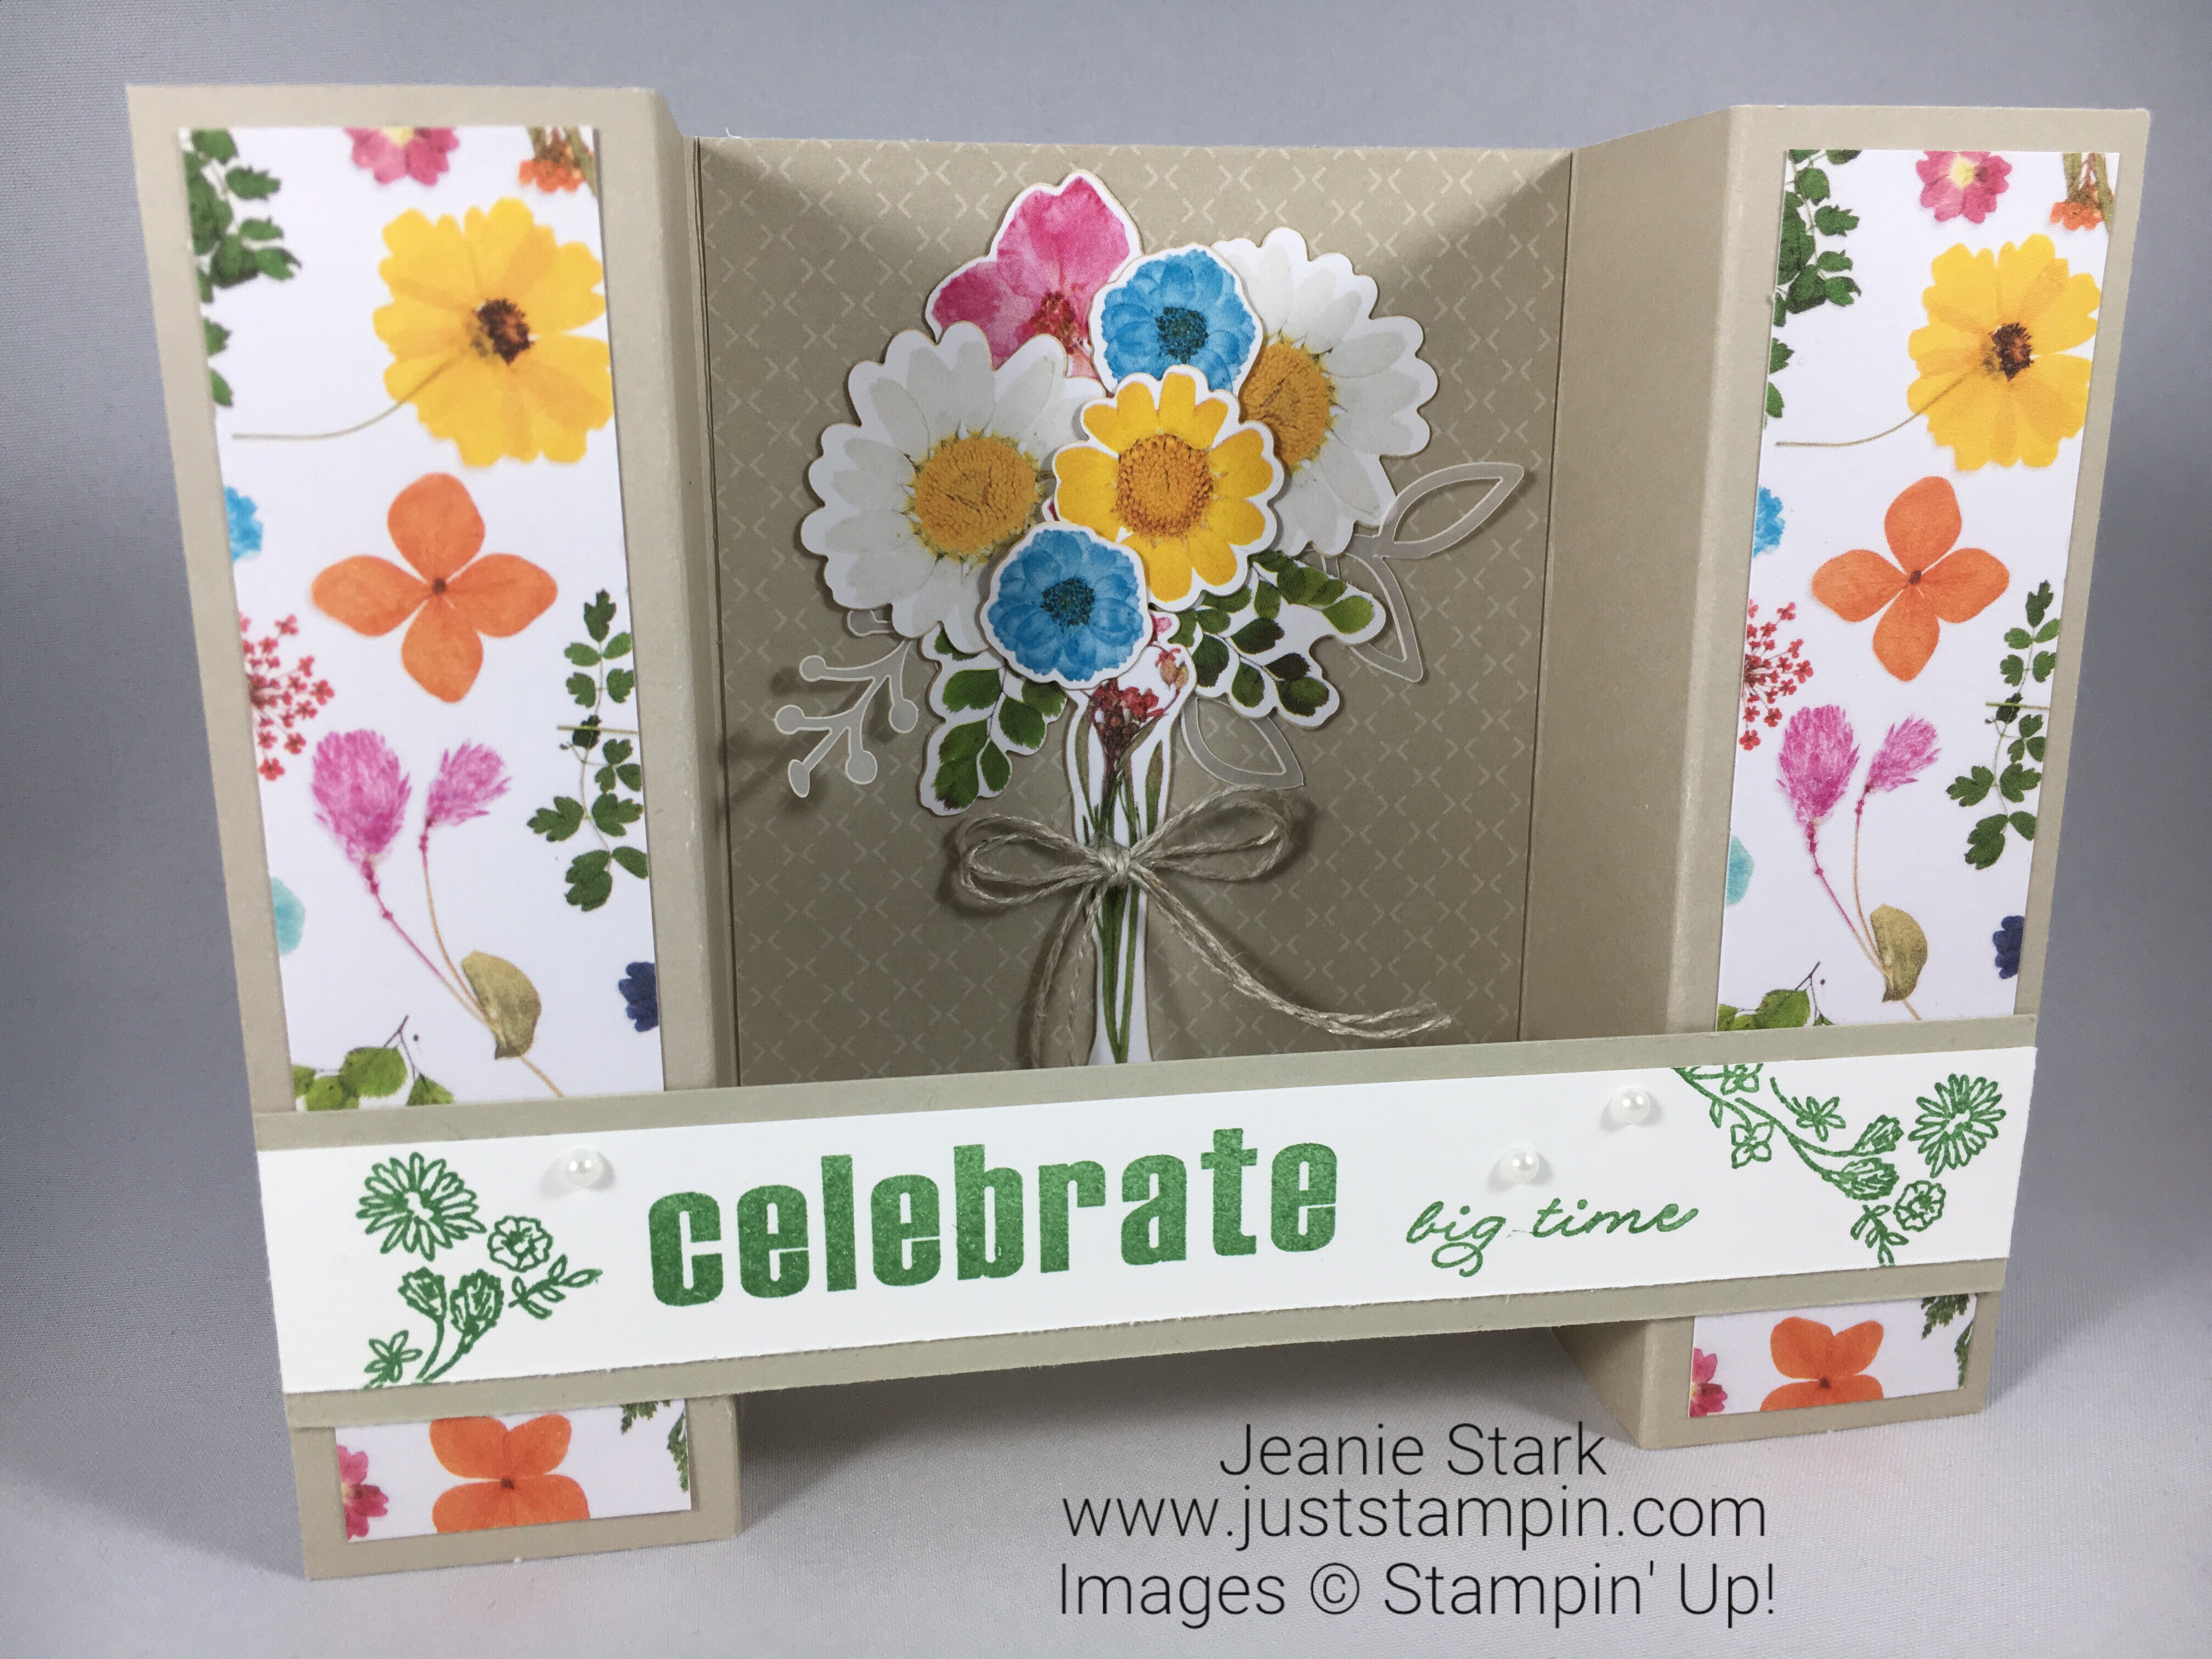 Stampin Up Paper Pumpkin Wildflower Wishes fun fold alternate celebrate card idea - Jeanie Stark StampinUp